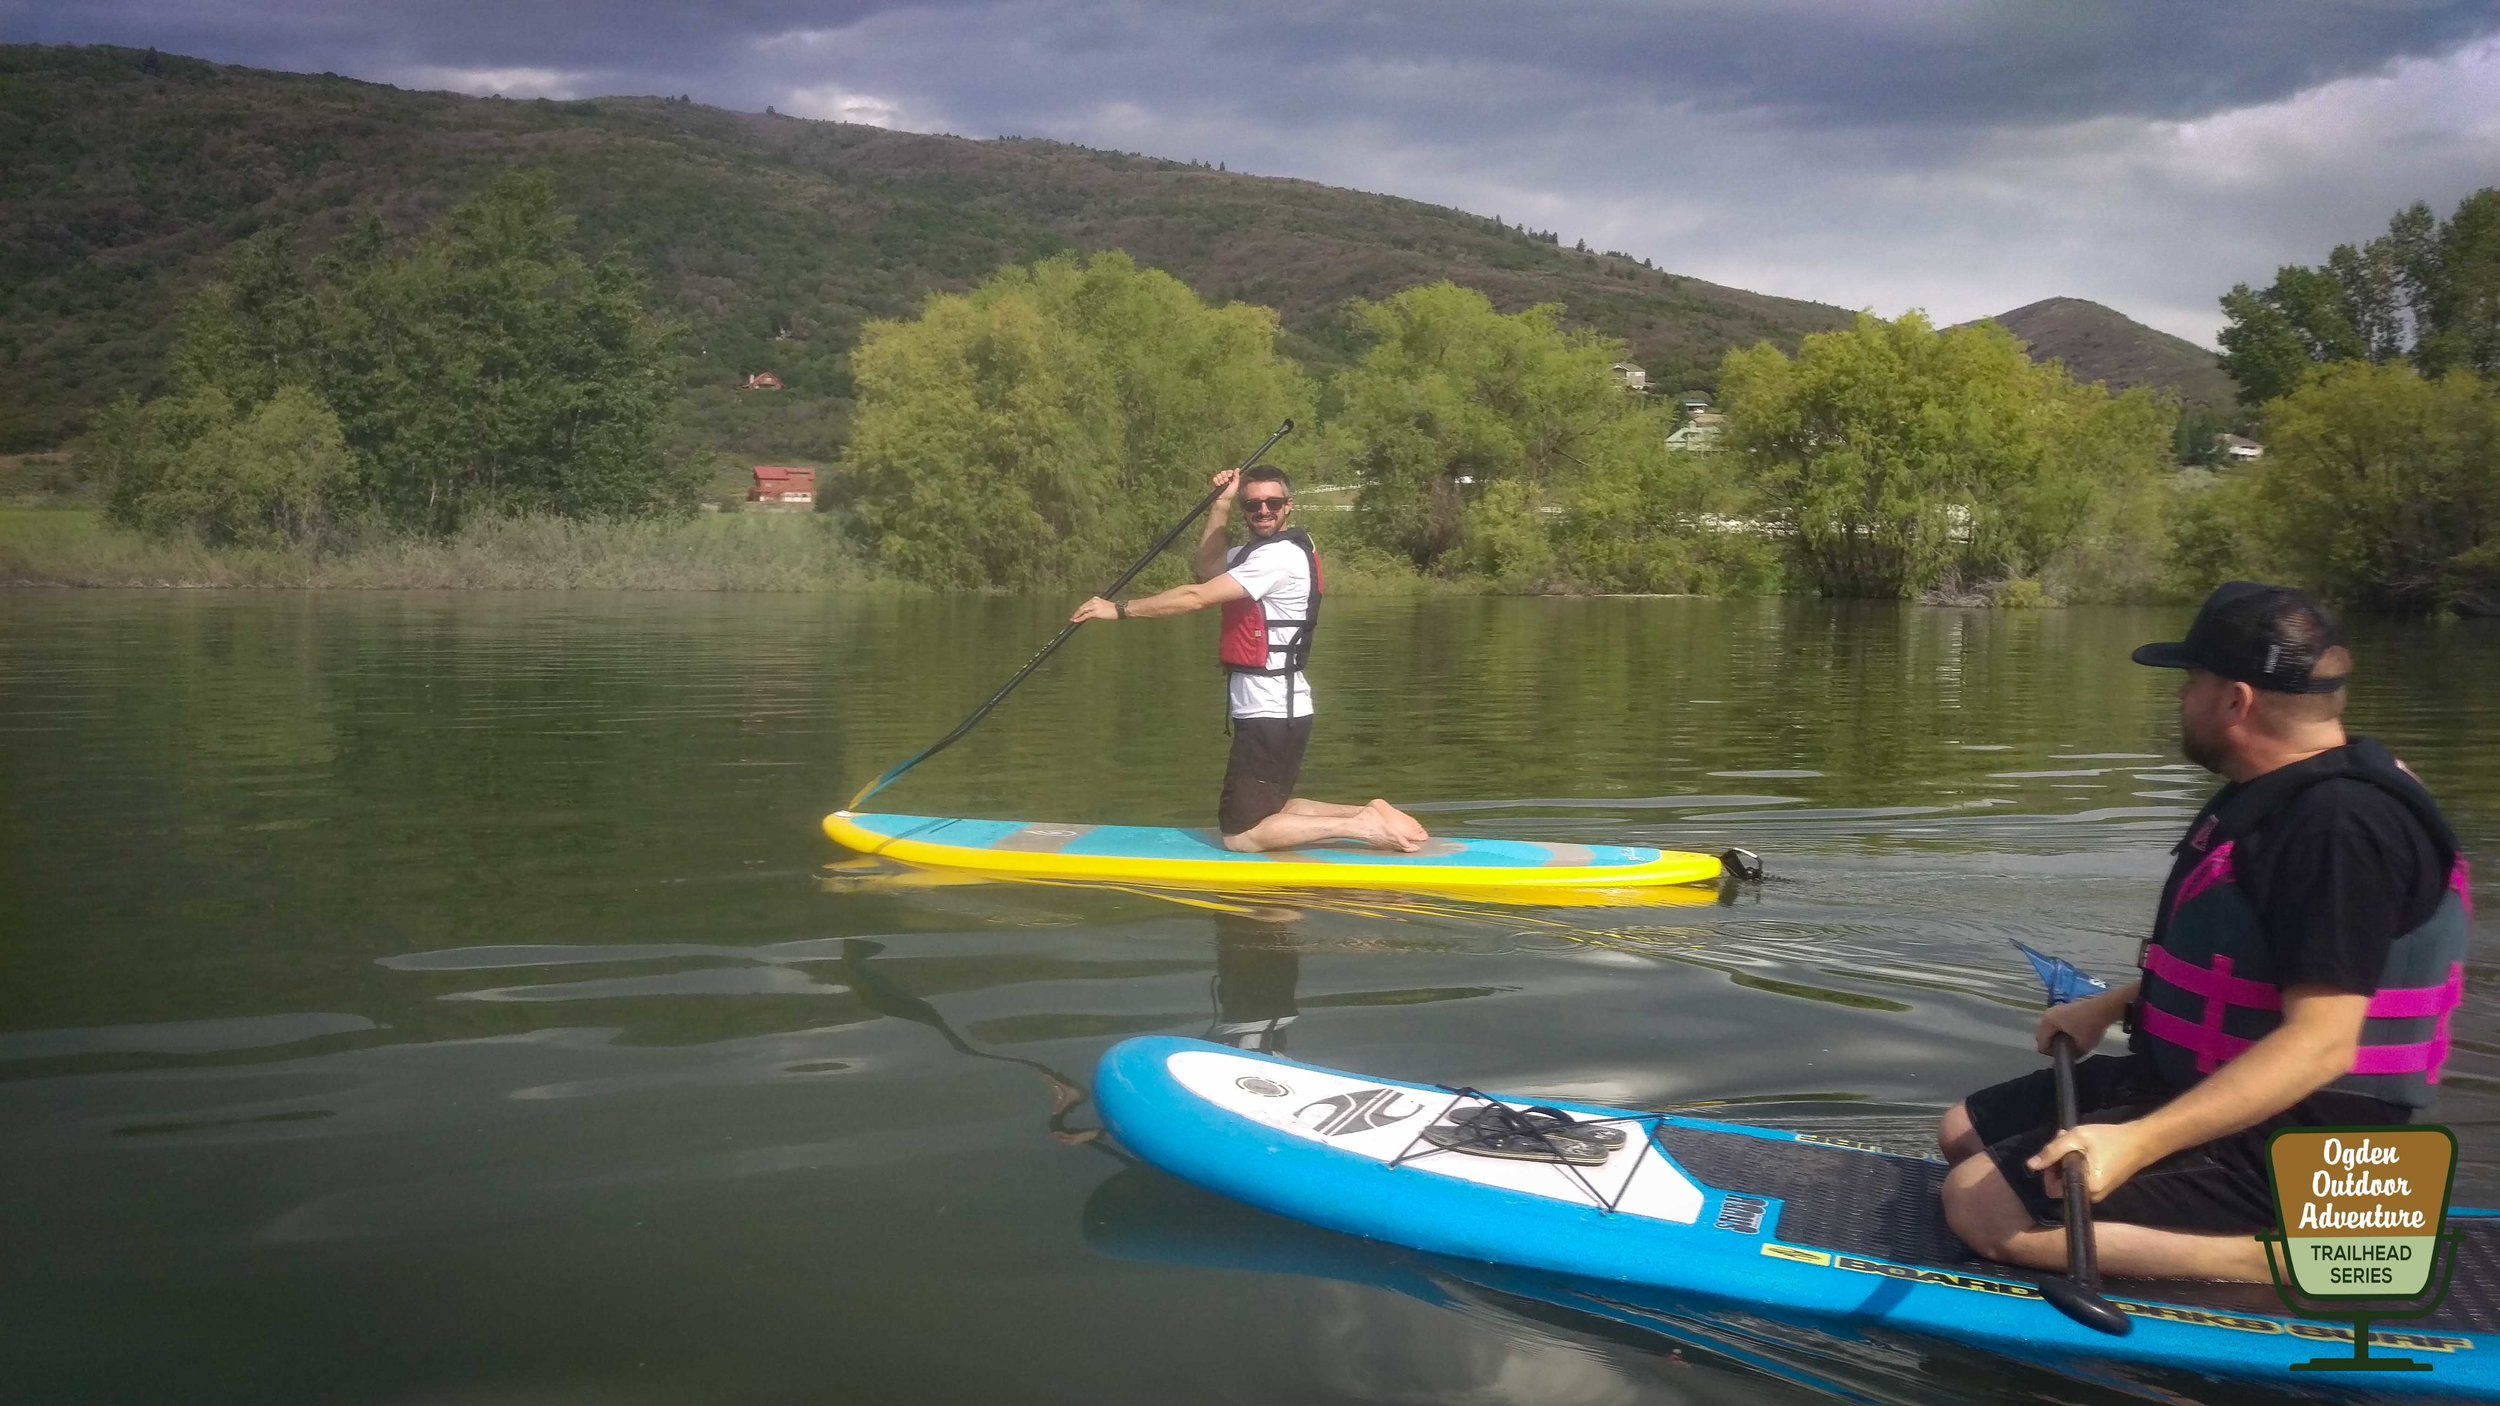 Ogden Outdoor Adventure Show 274 Muddy Rivers Telemark-4.jpg